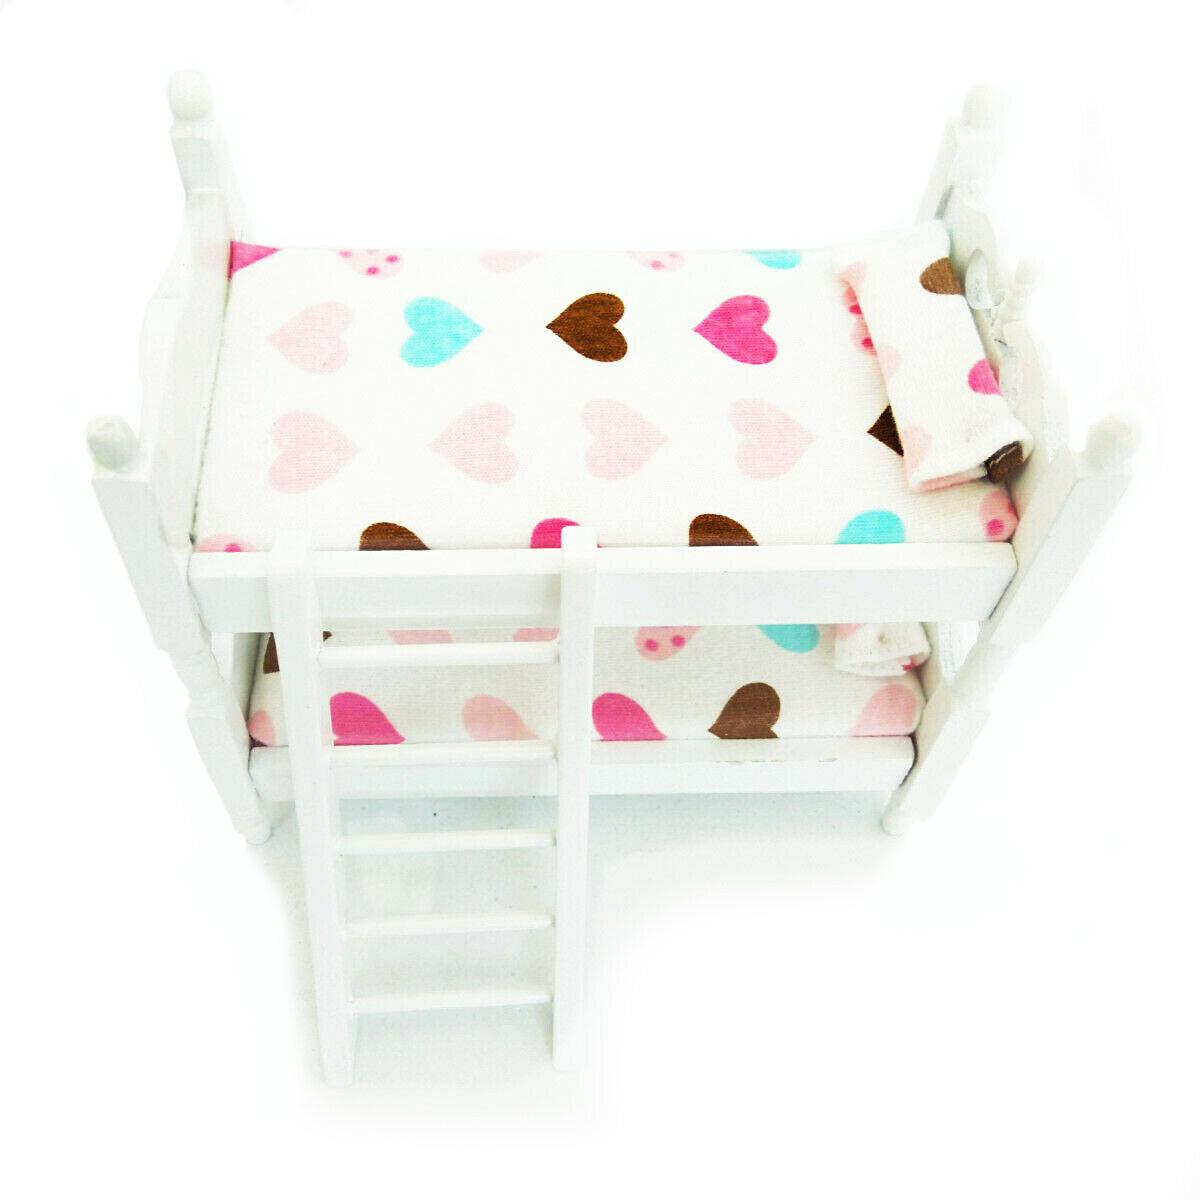 Details about Miniature Children Bedroom Bunk Bed Dollhouse 1:12 Furniture  Accessories B